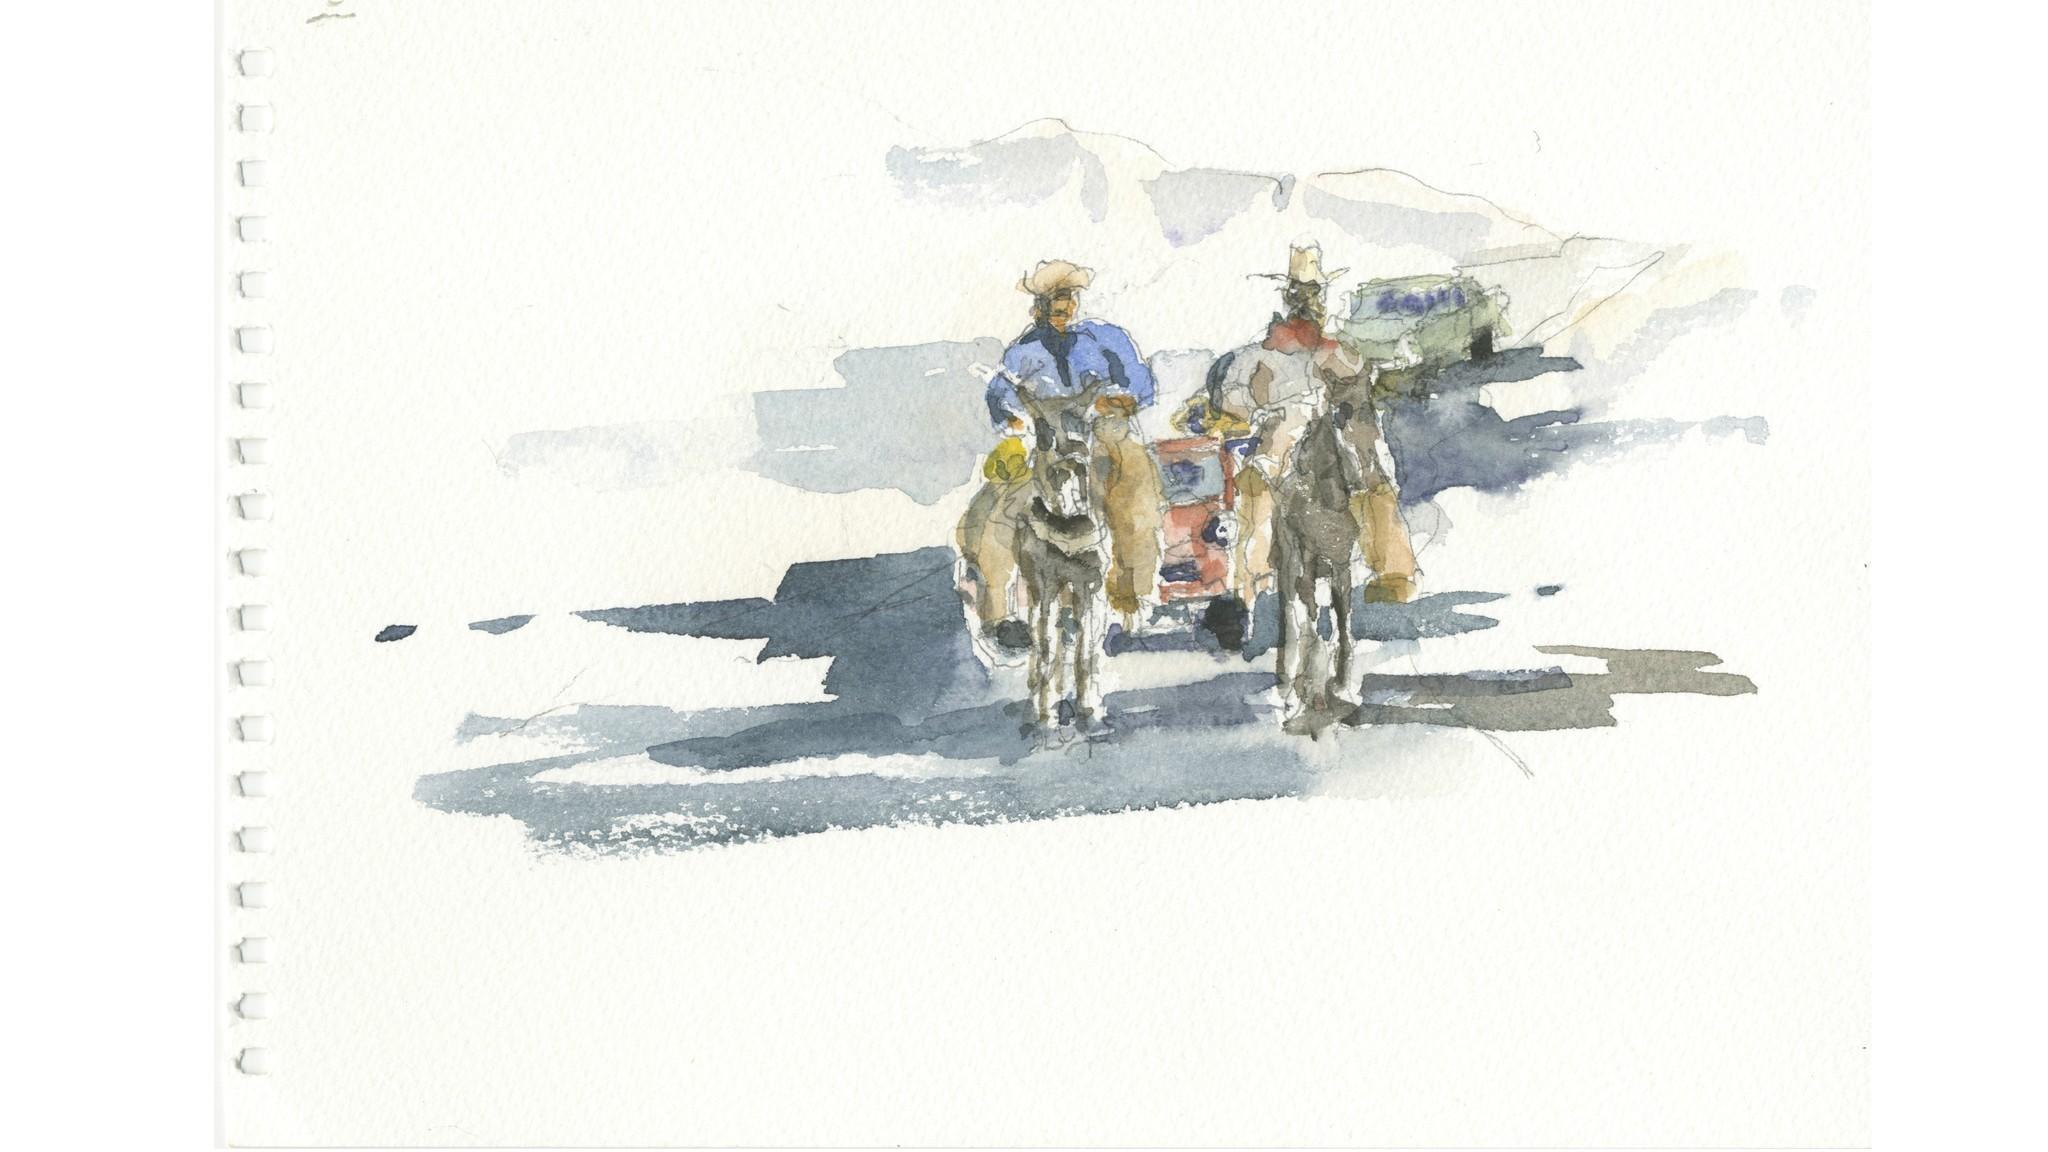 Pilgrims on horseback and in SUVs.